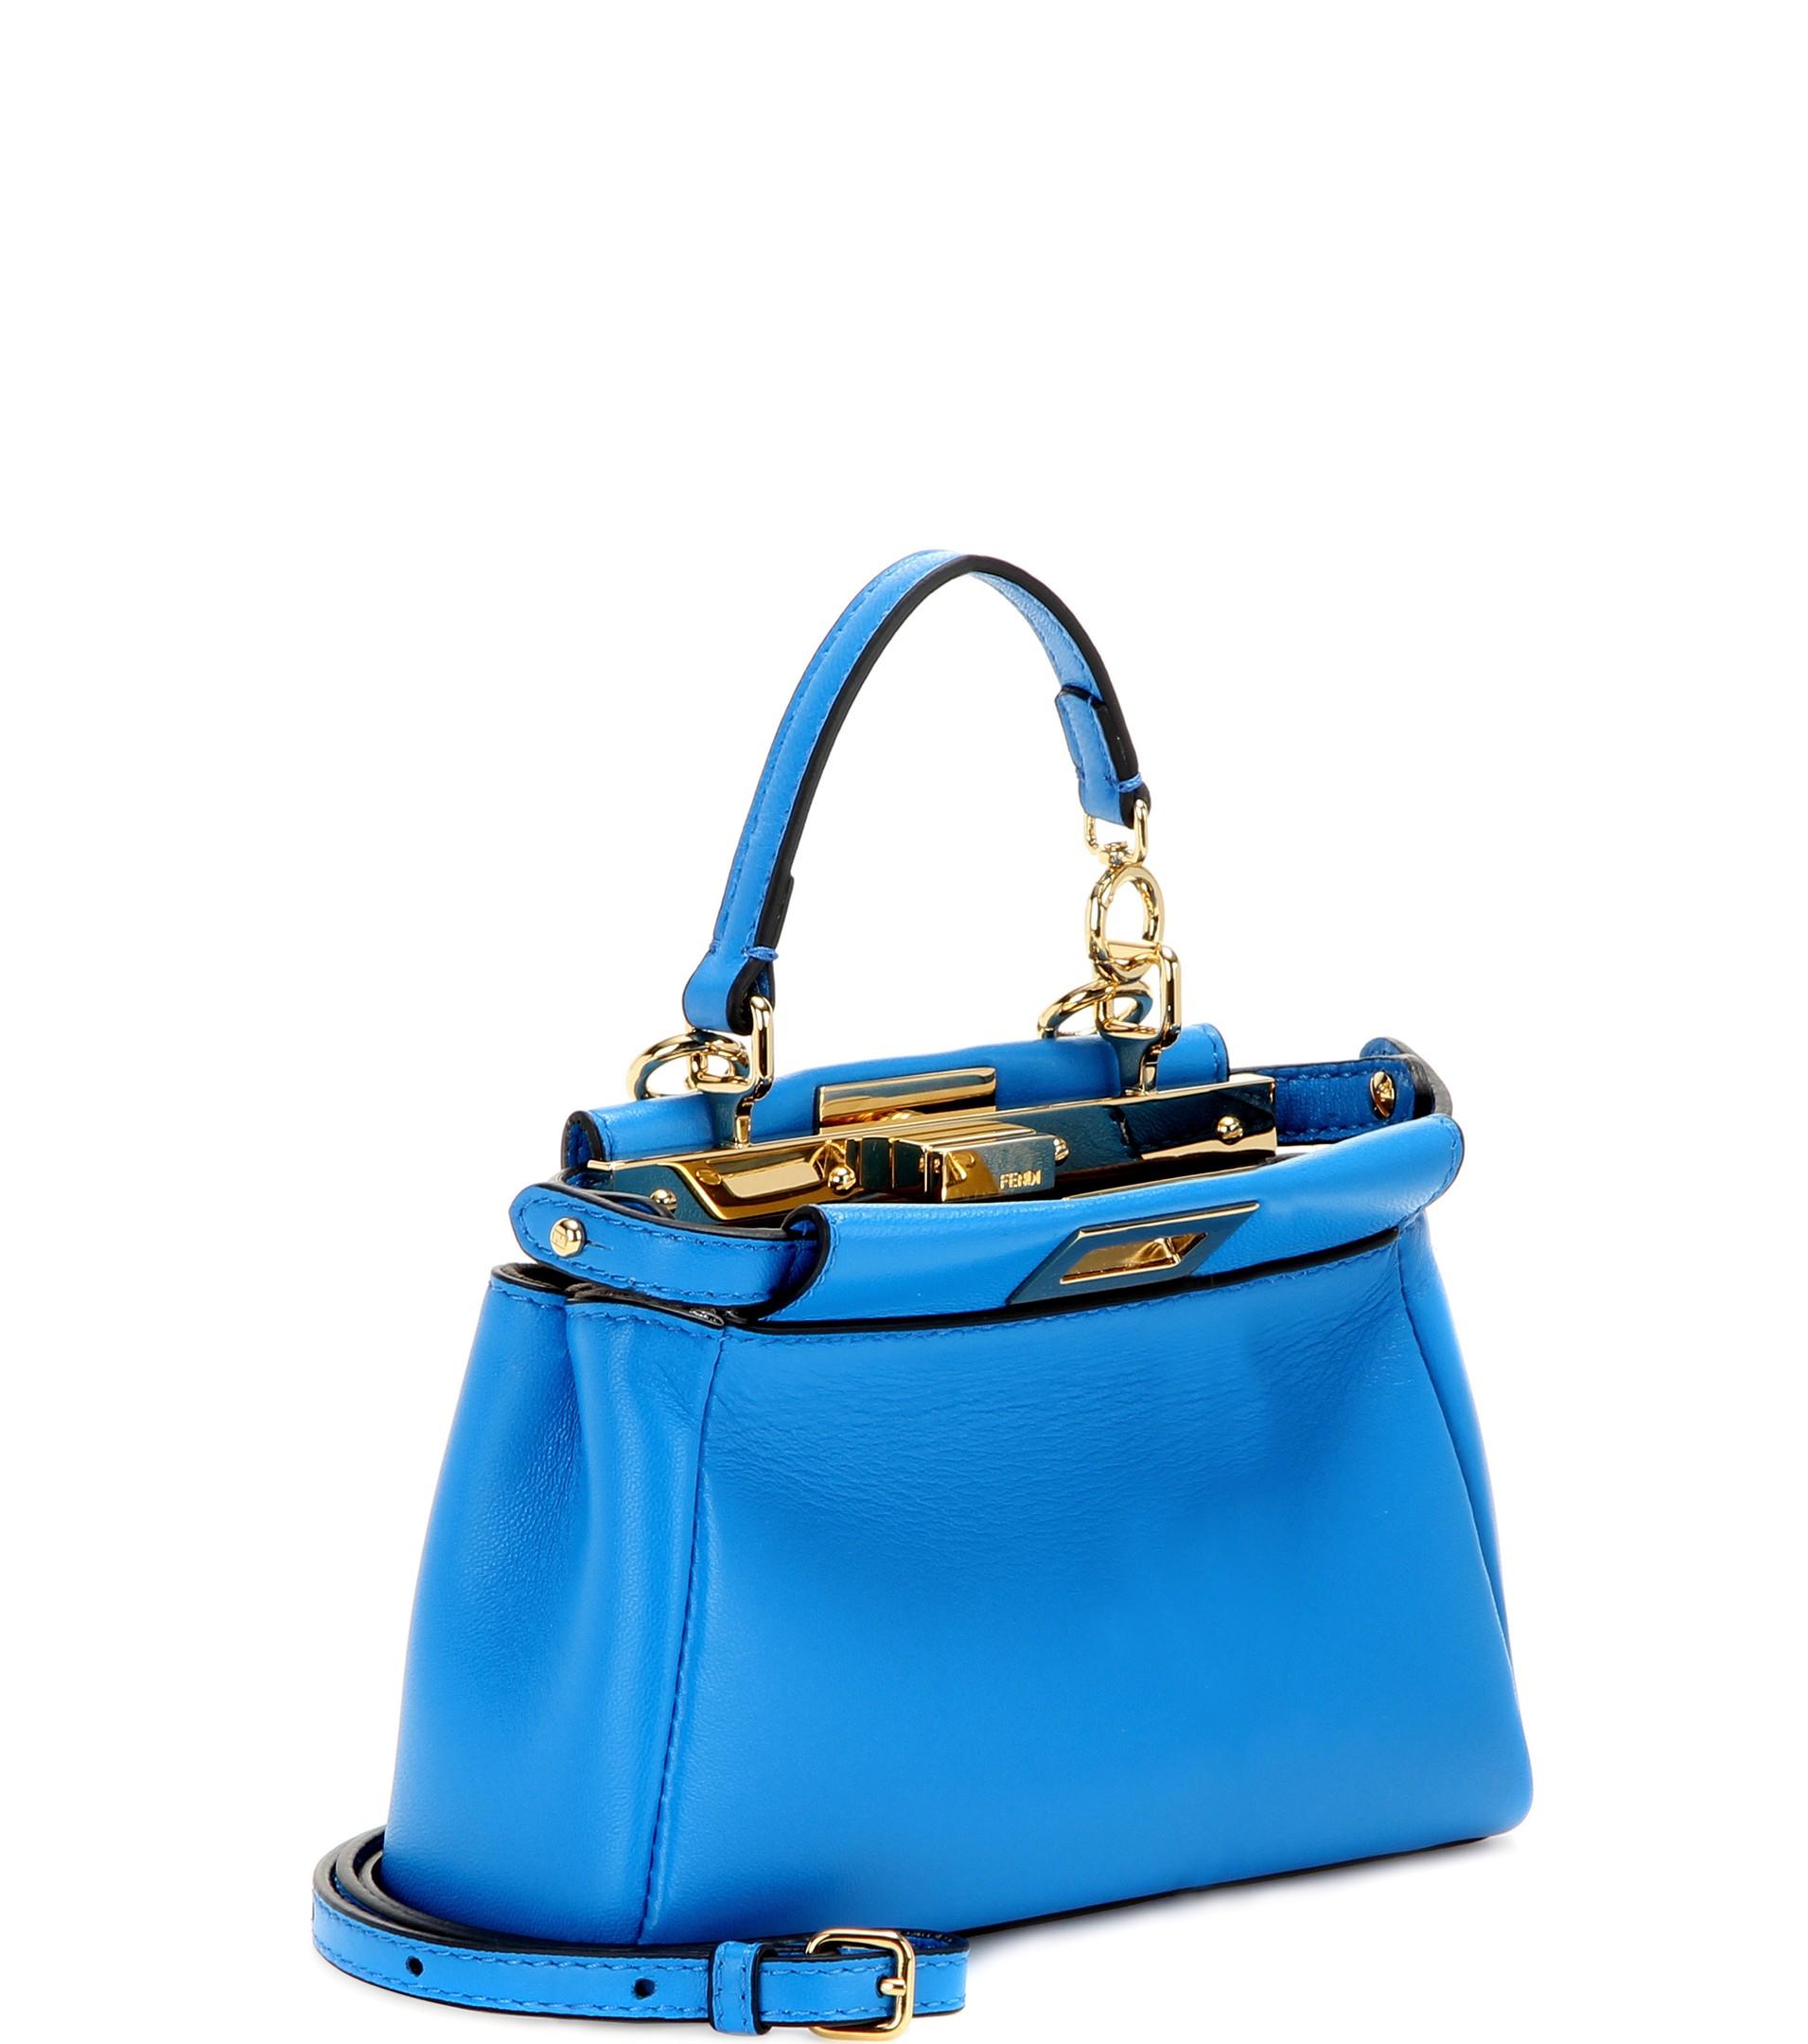 87753d4306 Lyst - Fendi Micro Peekaboo Leather Shoulder Bag in Blue